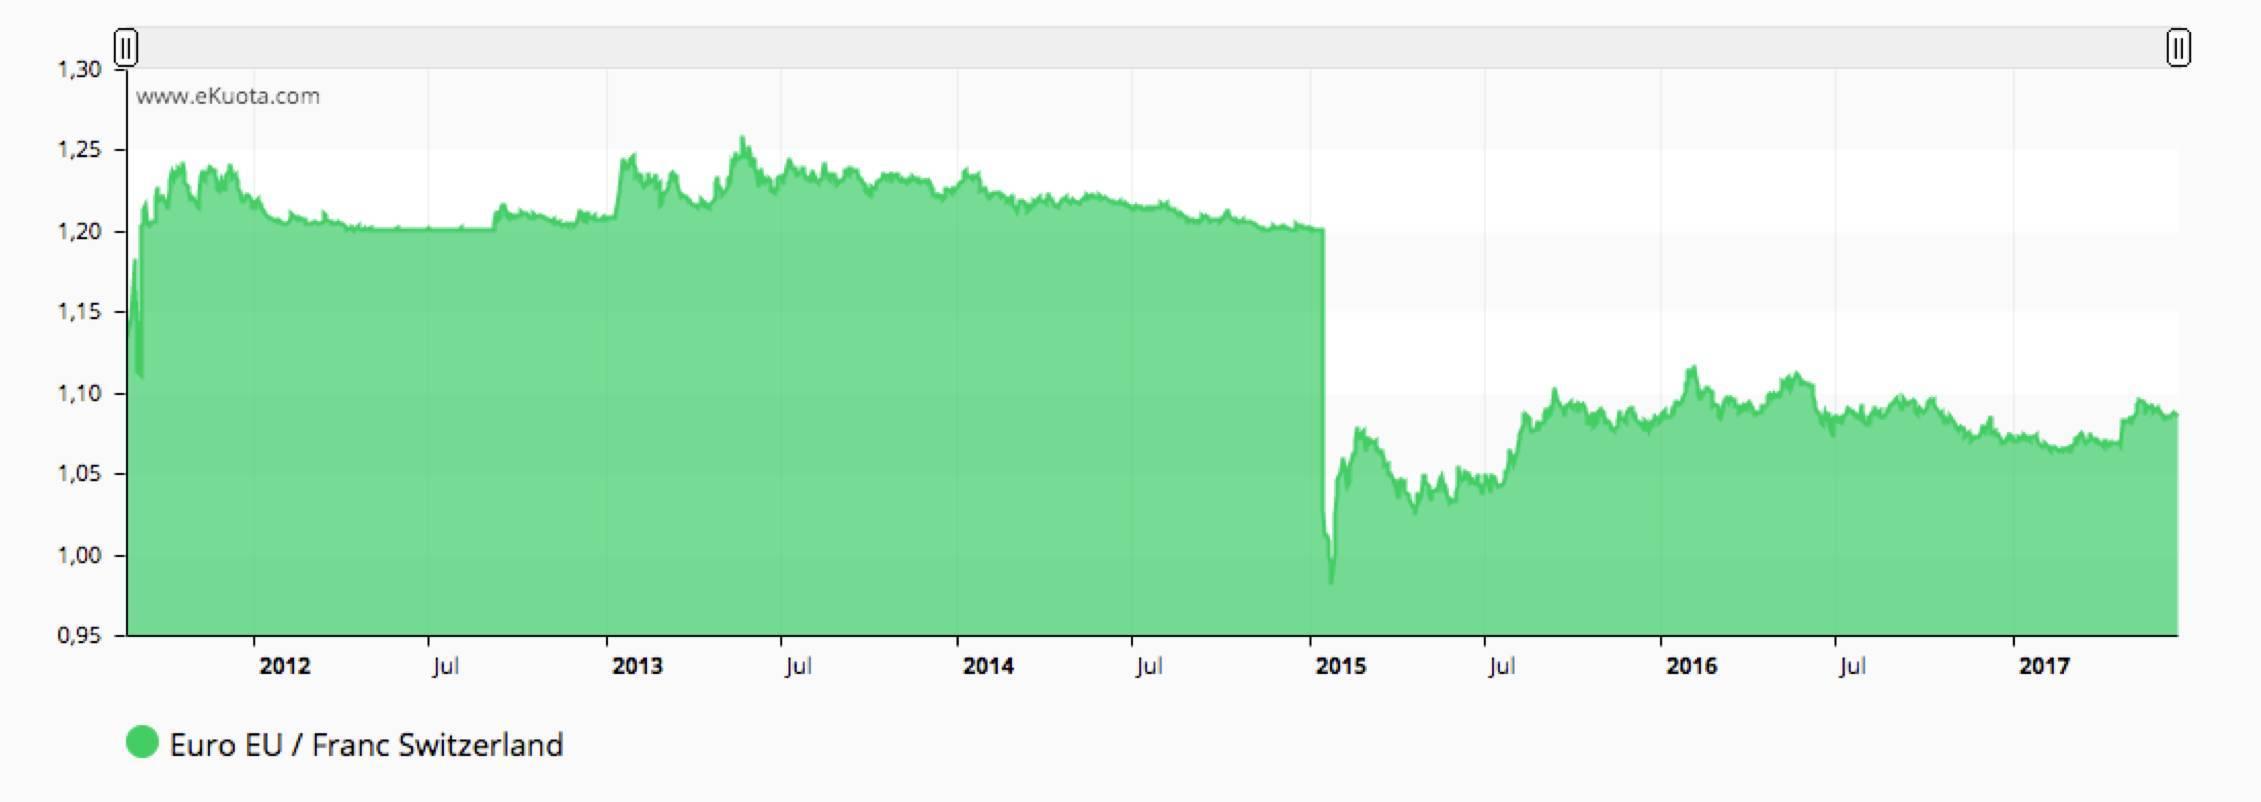 Euro CHF FX -ekuota.com